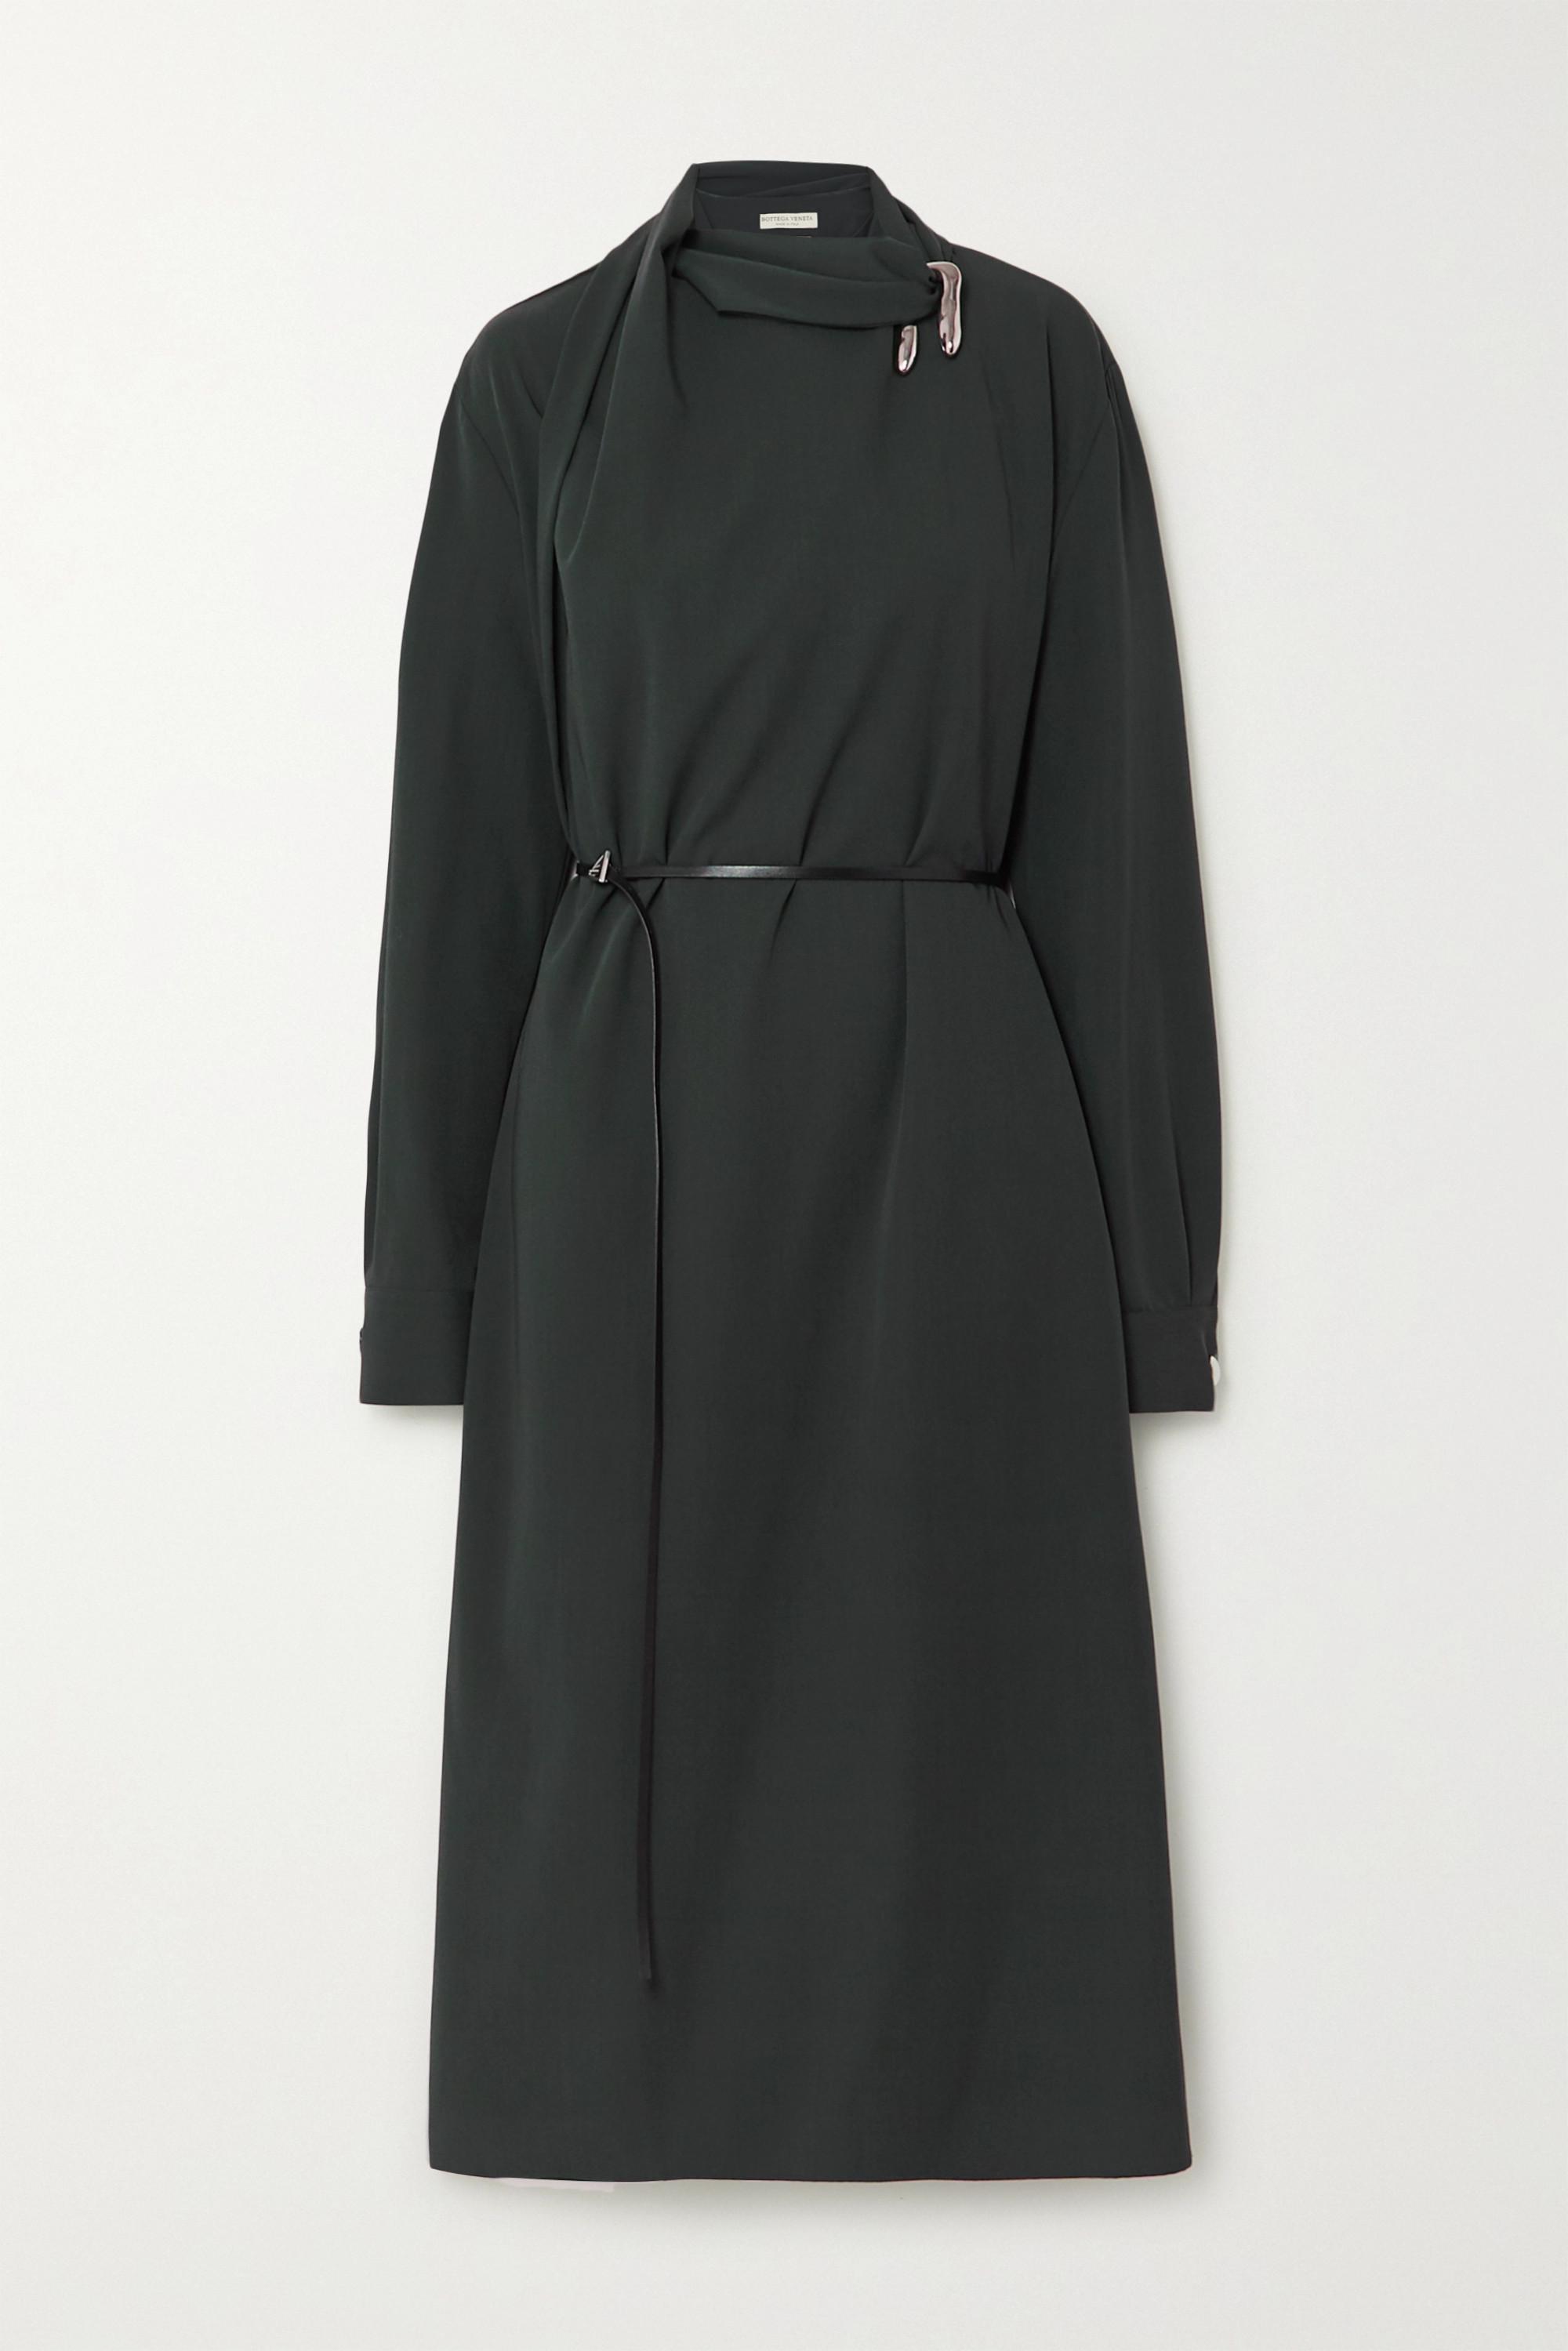 Bottega Veneta Belted embellished wool wrap dress